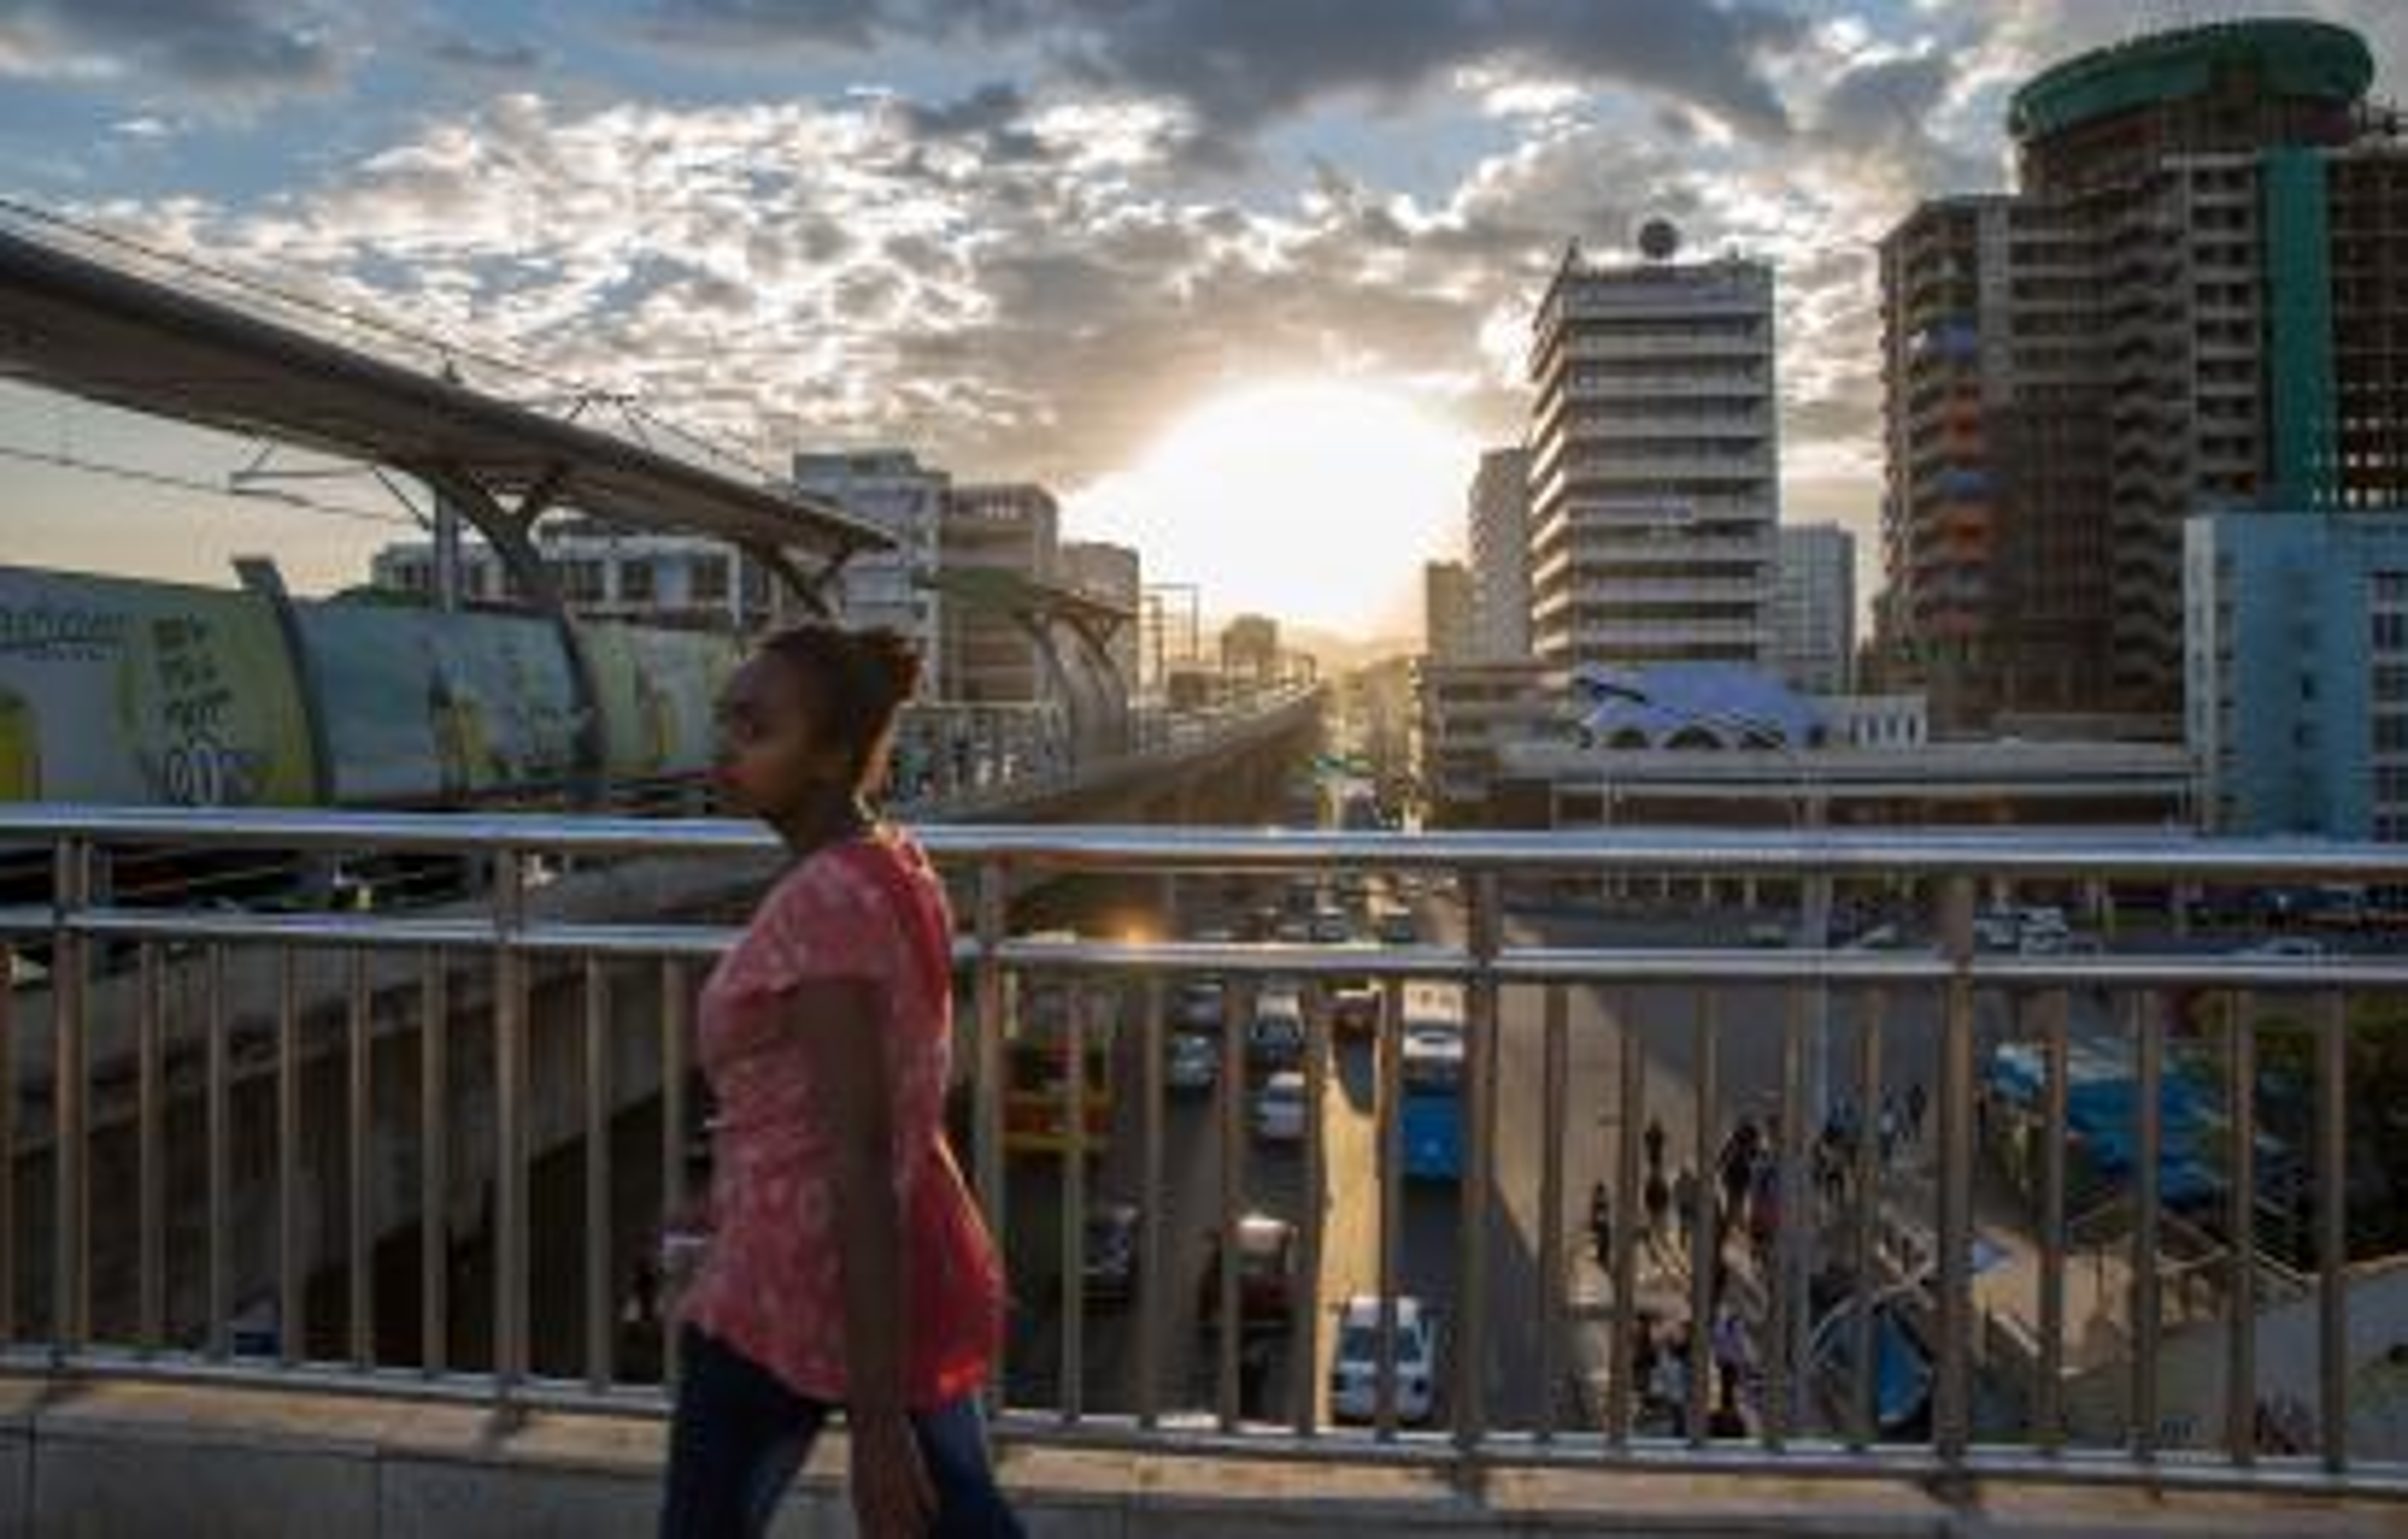 Ethiopia has one of the fastest economies in Africa